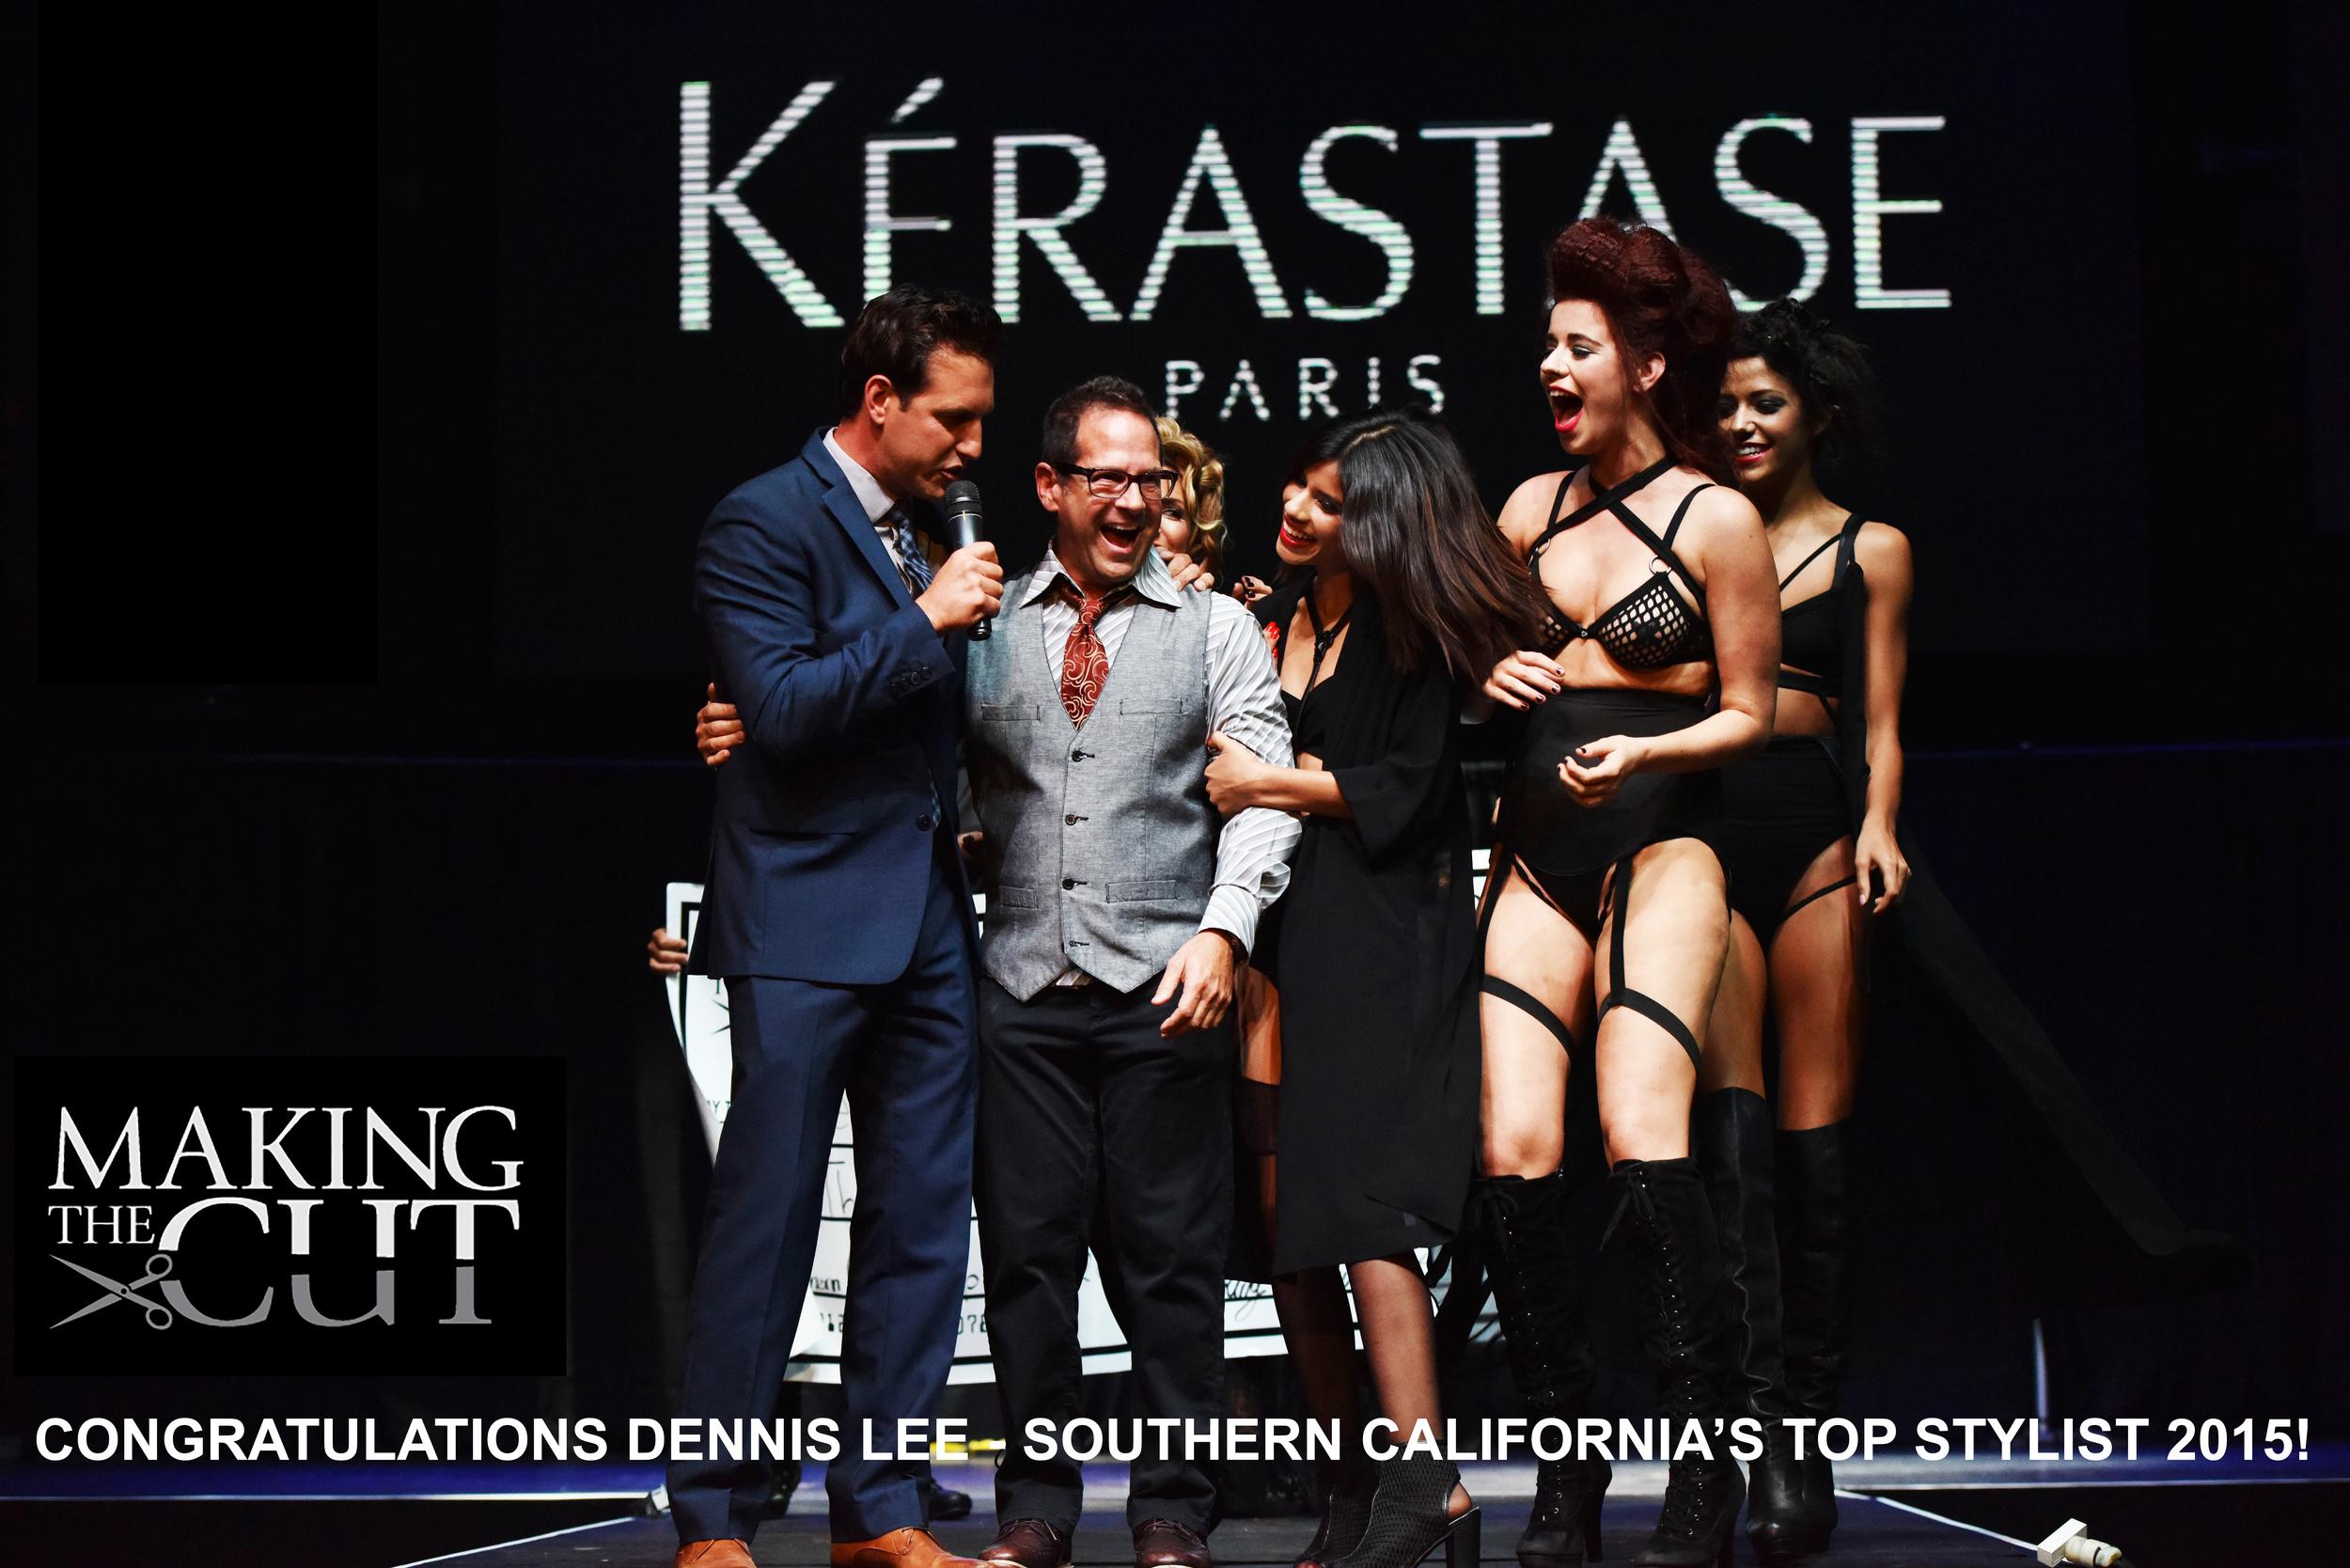 2015 Southern California's Top Stylist: Dennis Lee of Armando Joshua Christopher Salon in Newport Beach